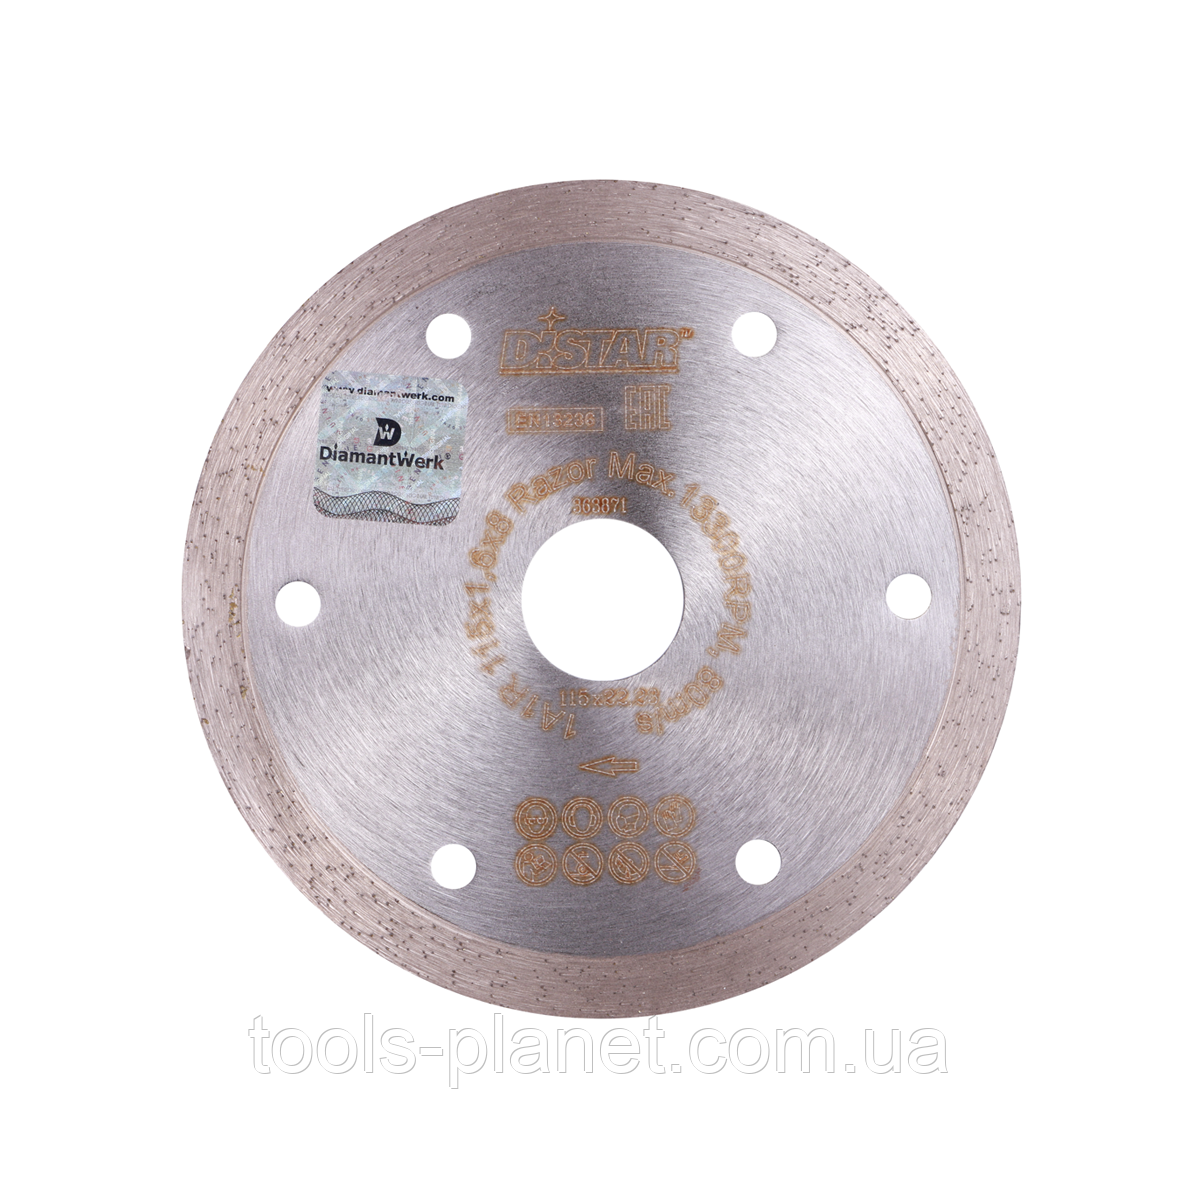 Алмазный диск Distar 1A1R 115 x 1,6 x 10 x 22,23 Razor 5D (11115062009)